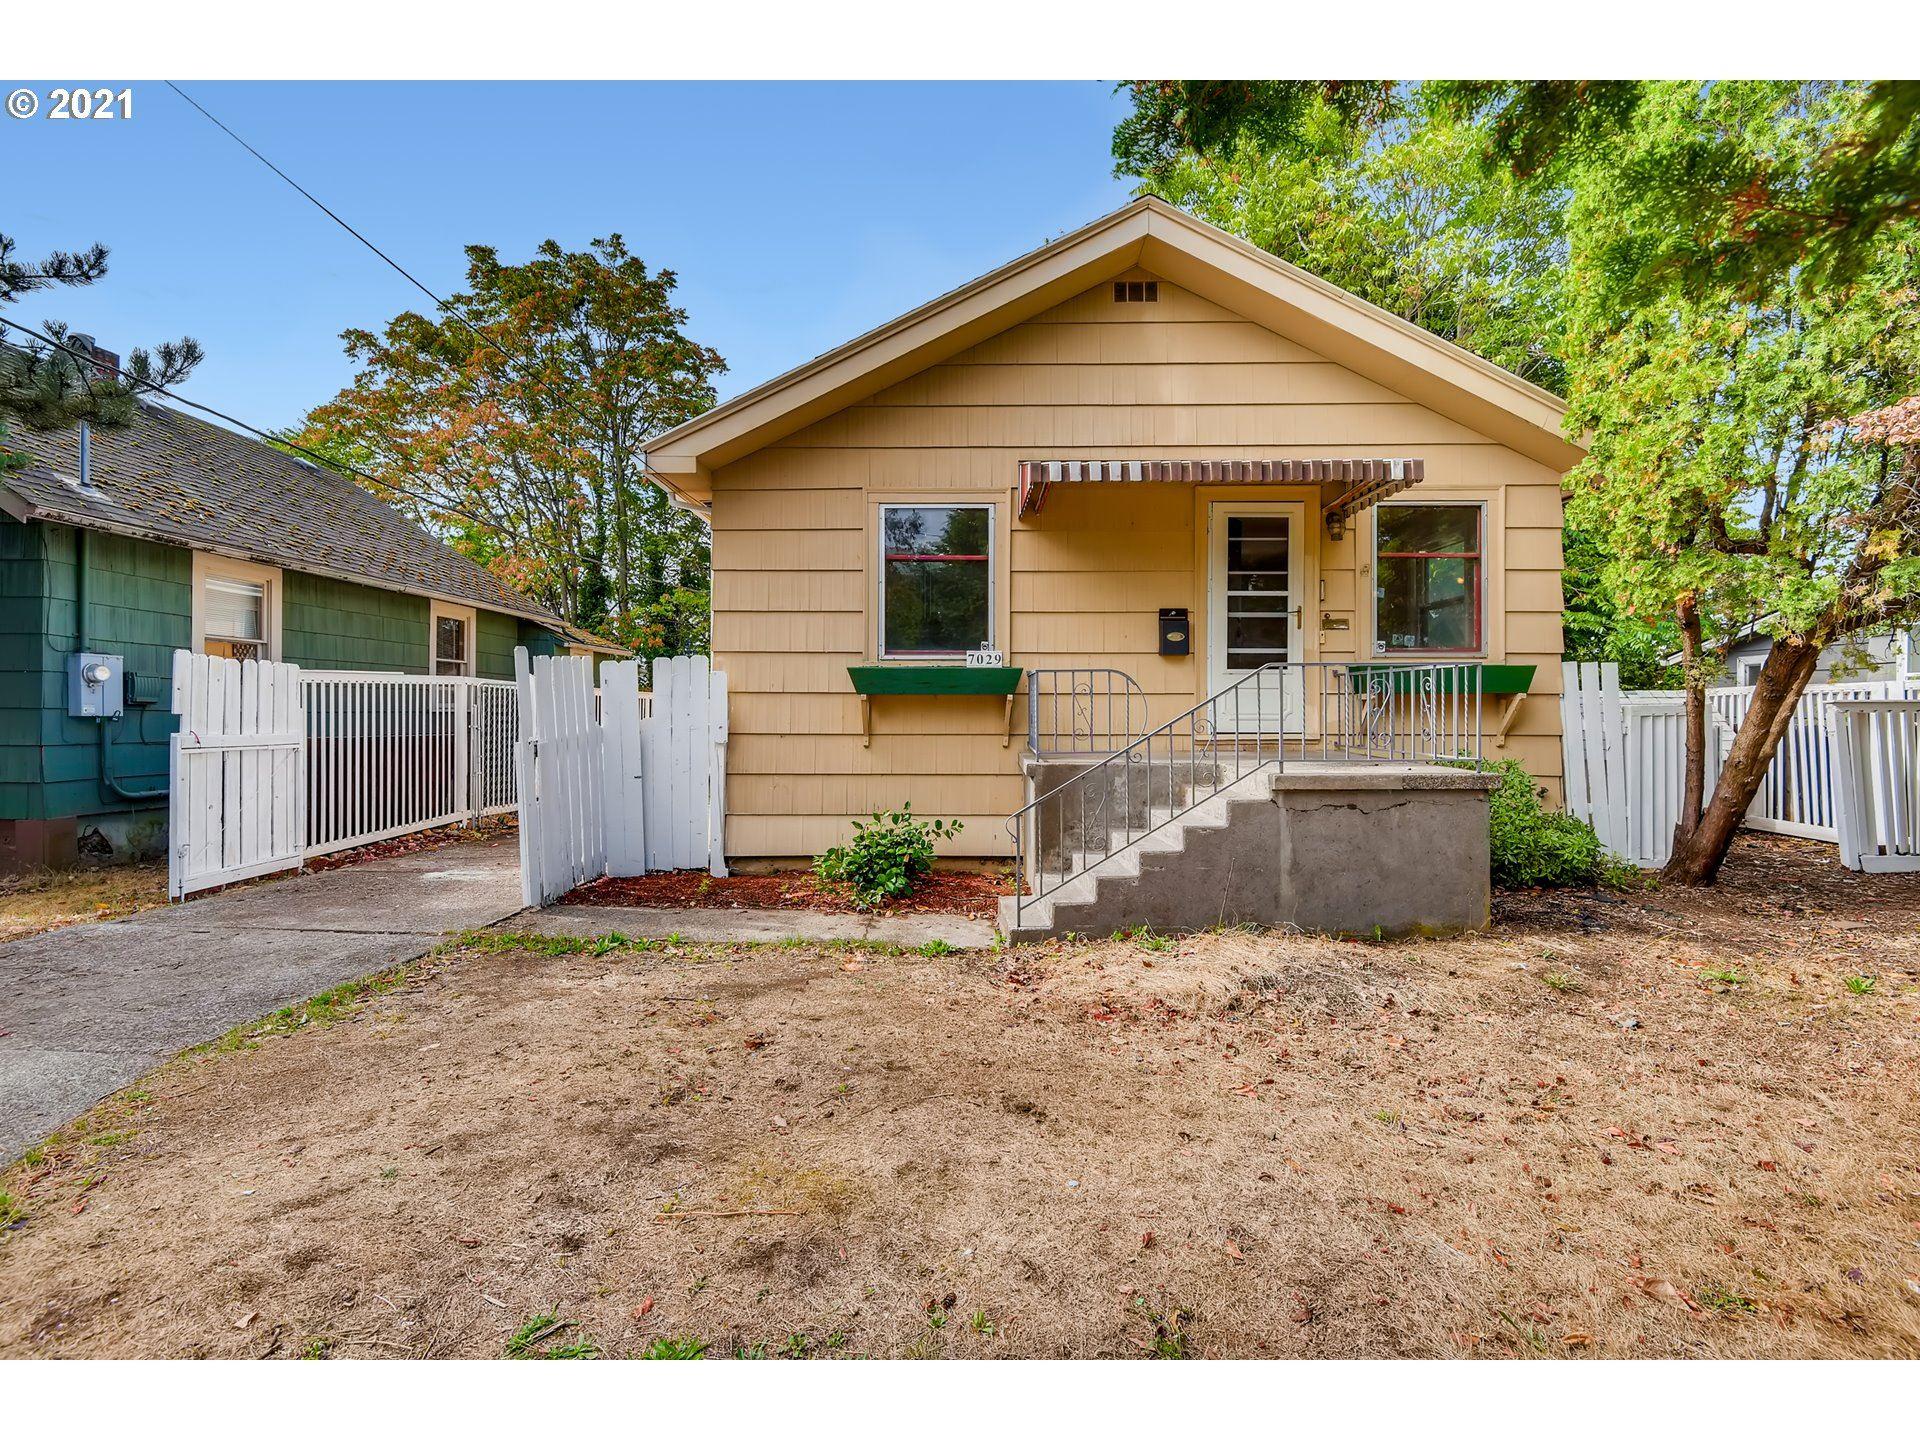 7029 SE 83RD AVE, Portland, OR 97266 - MLS#: 21088863